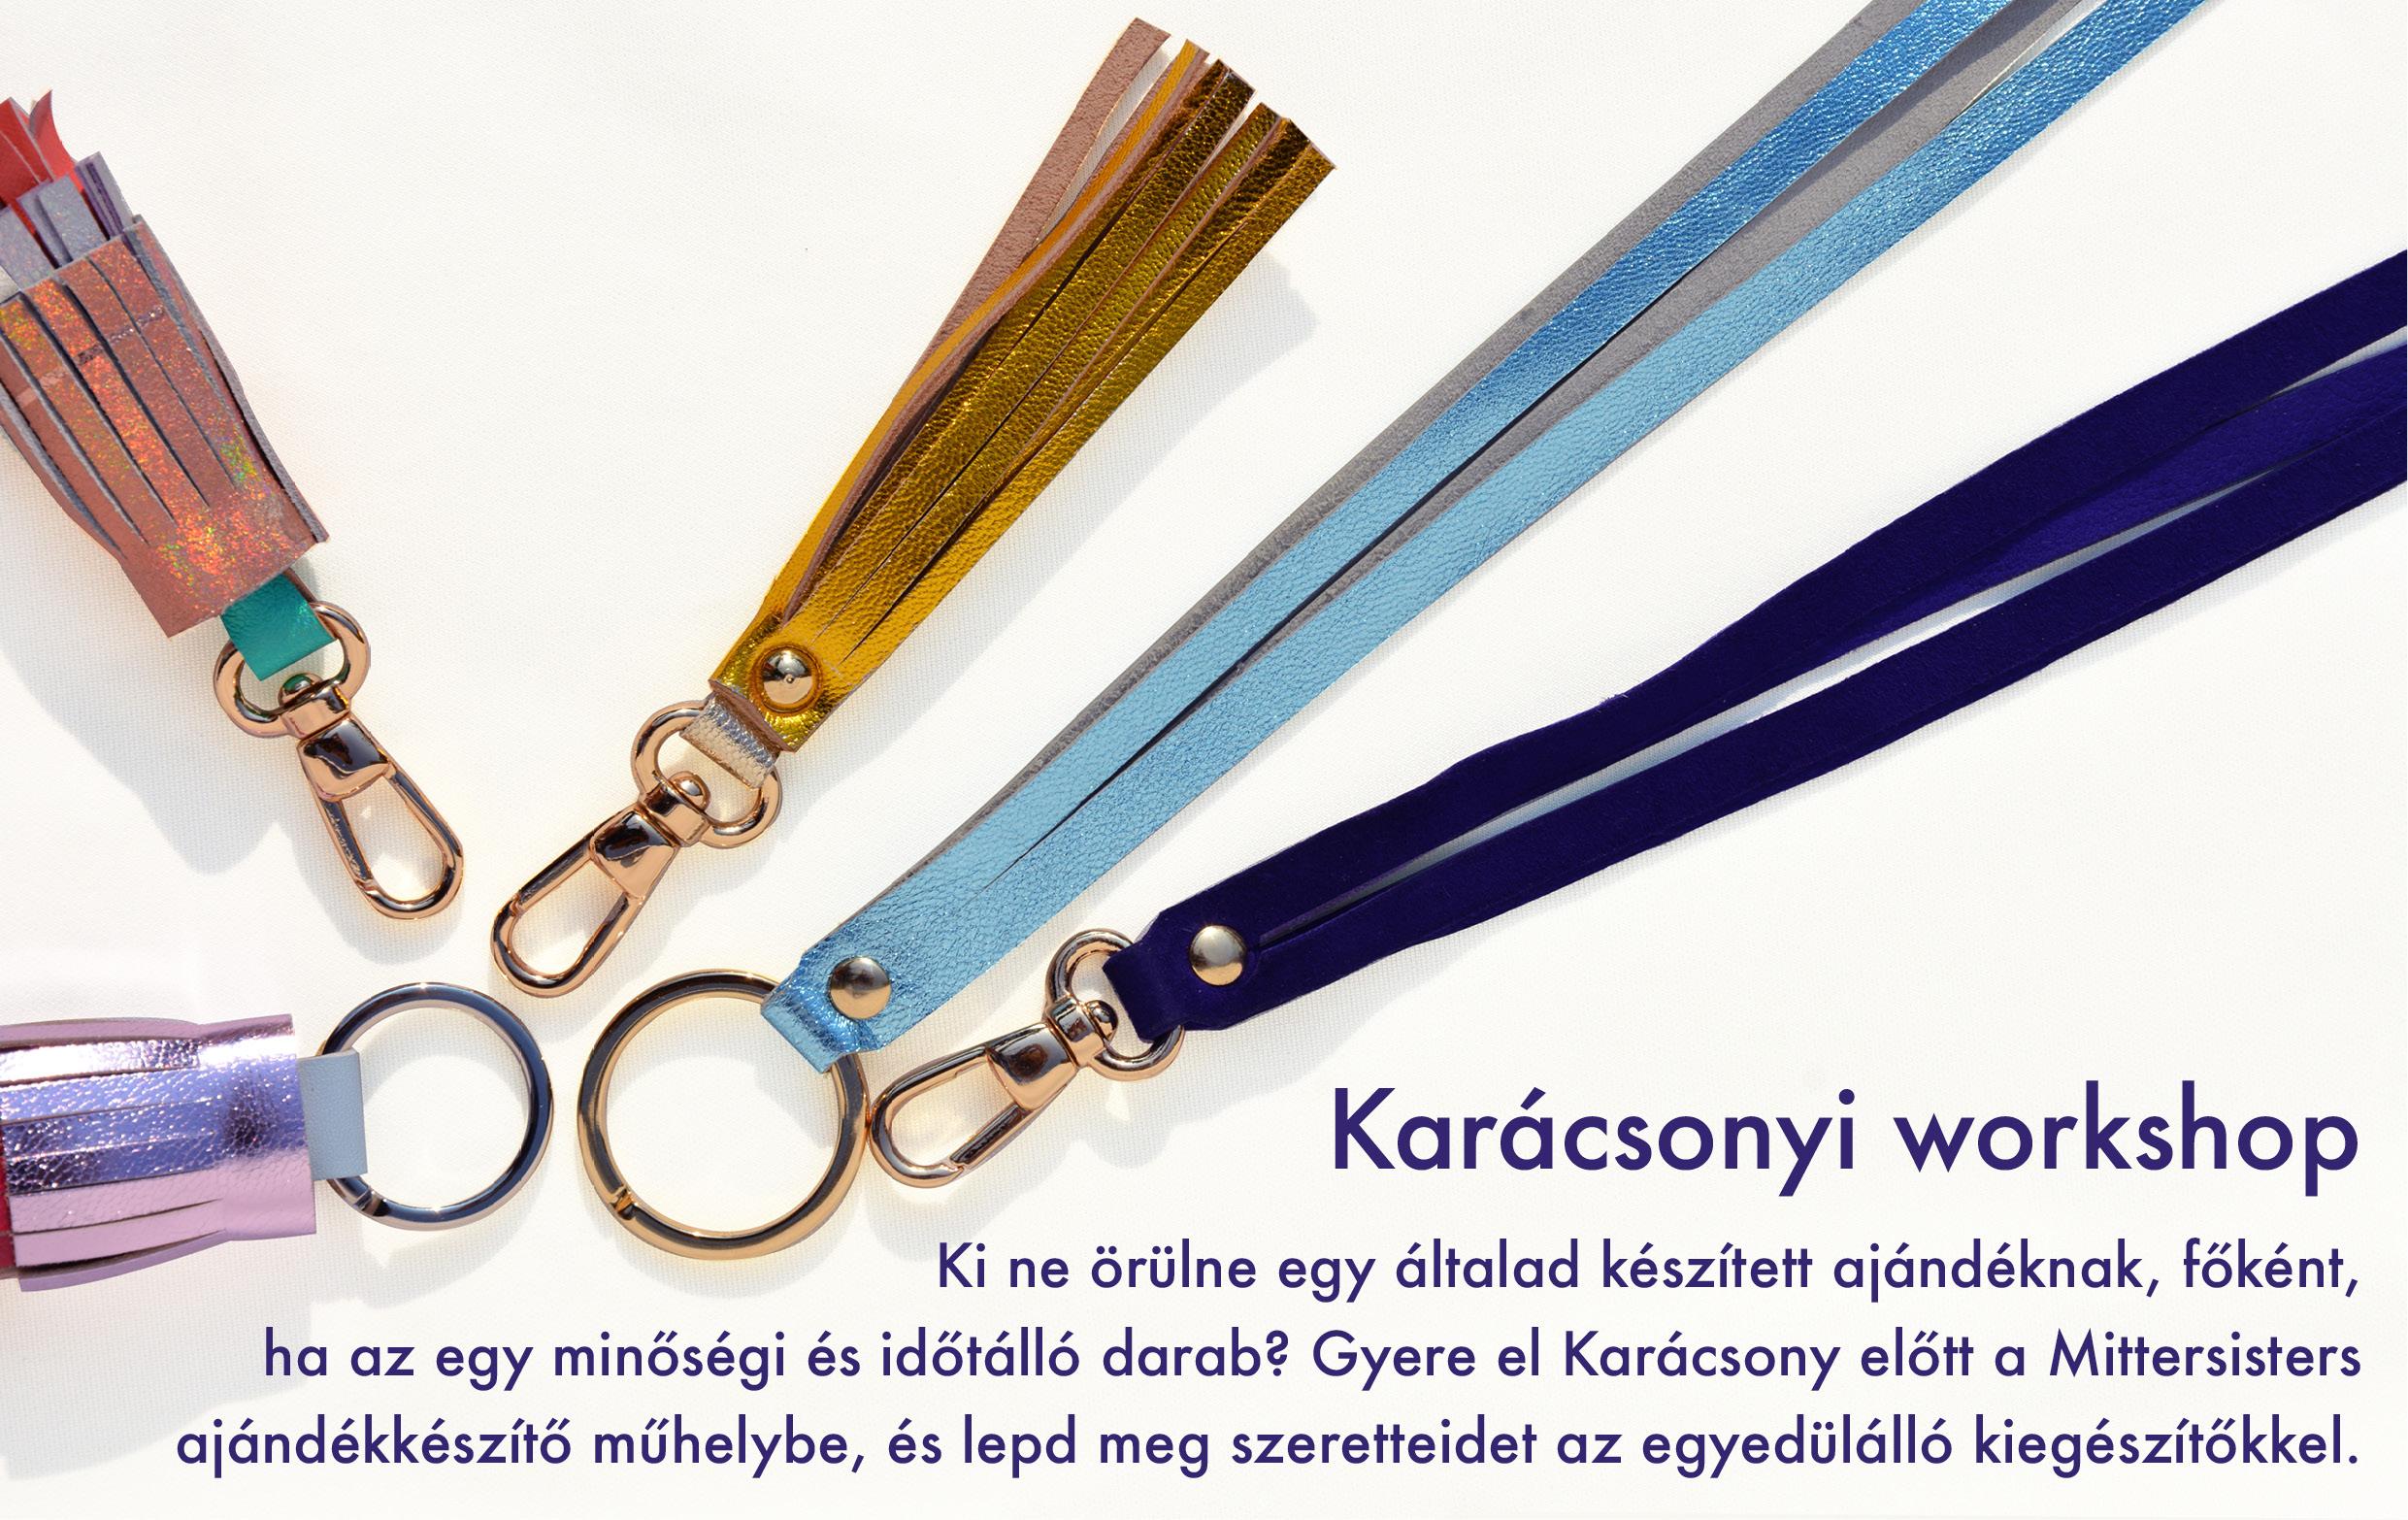 karacsonyi_workshop_popup